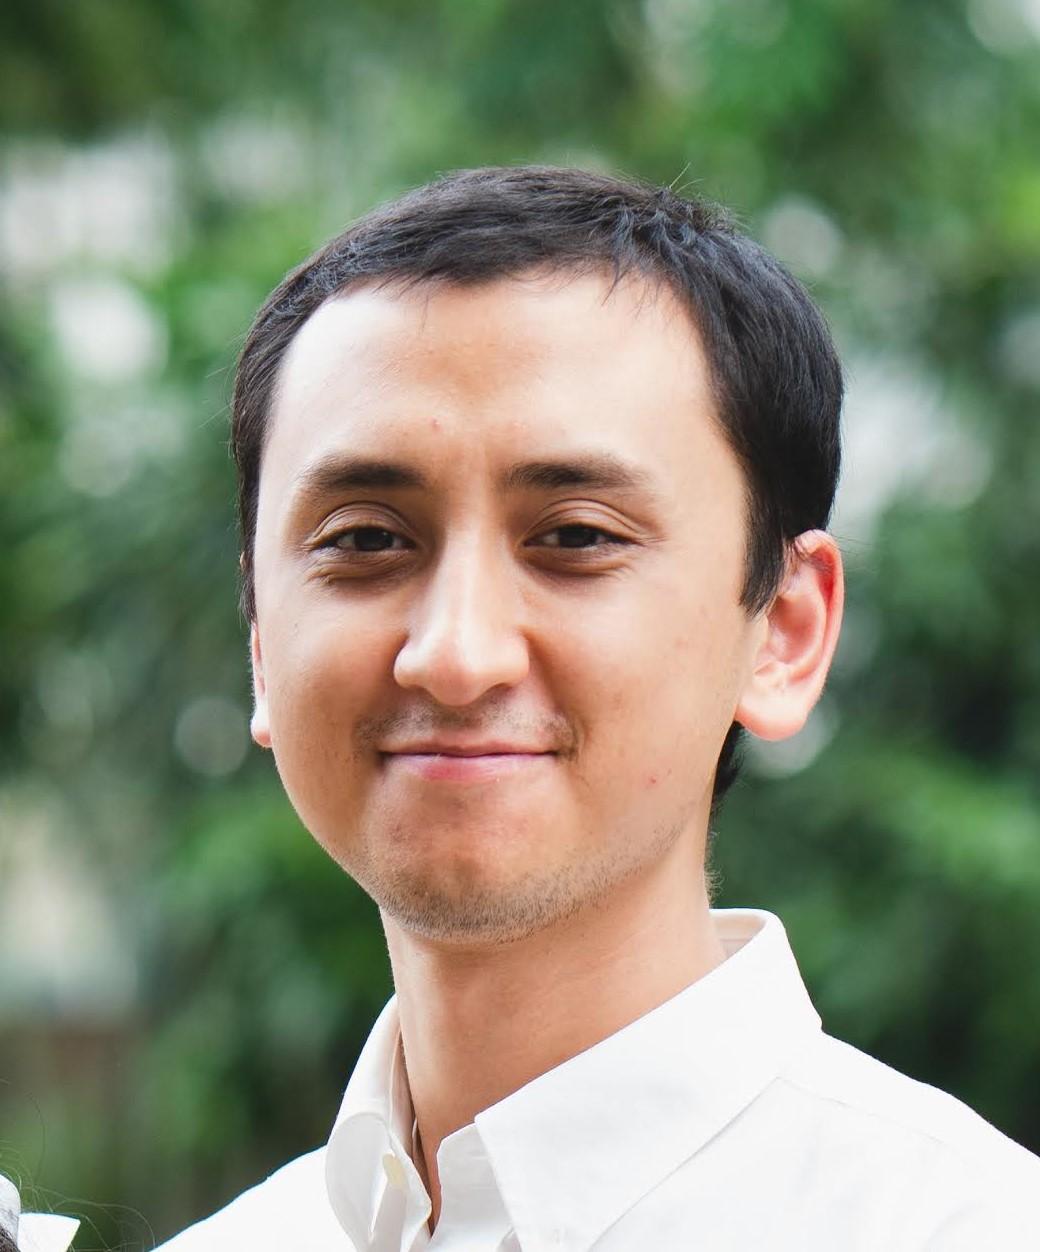 Arturo Klisowski - Assistant Dir. of Technology